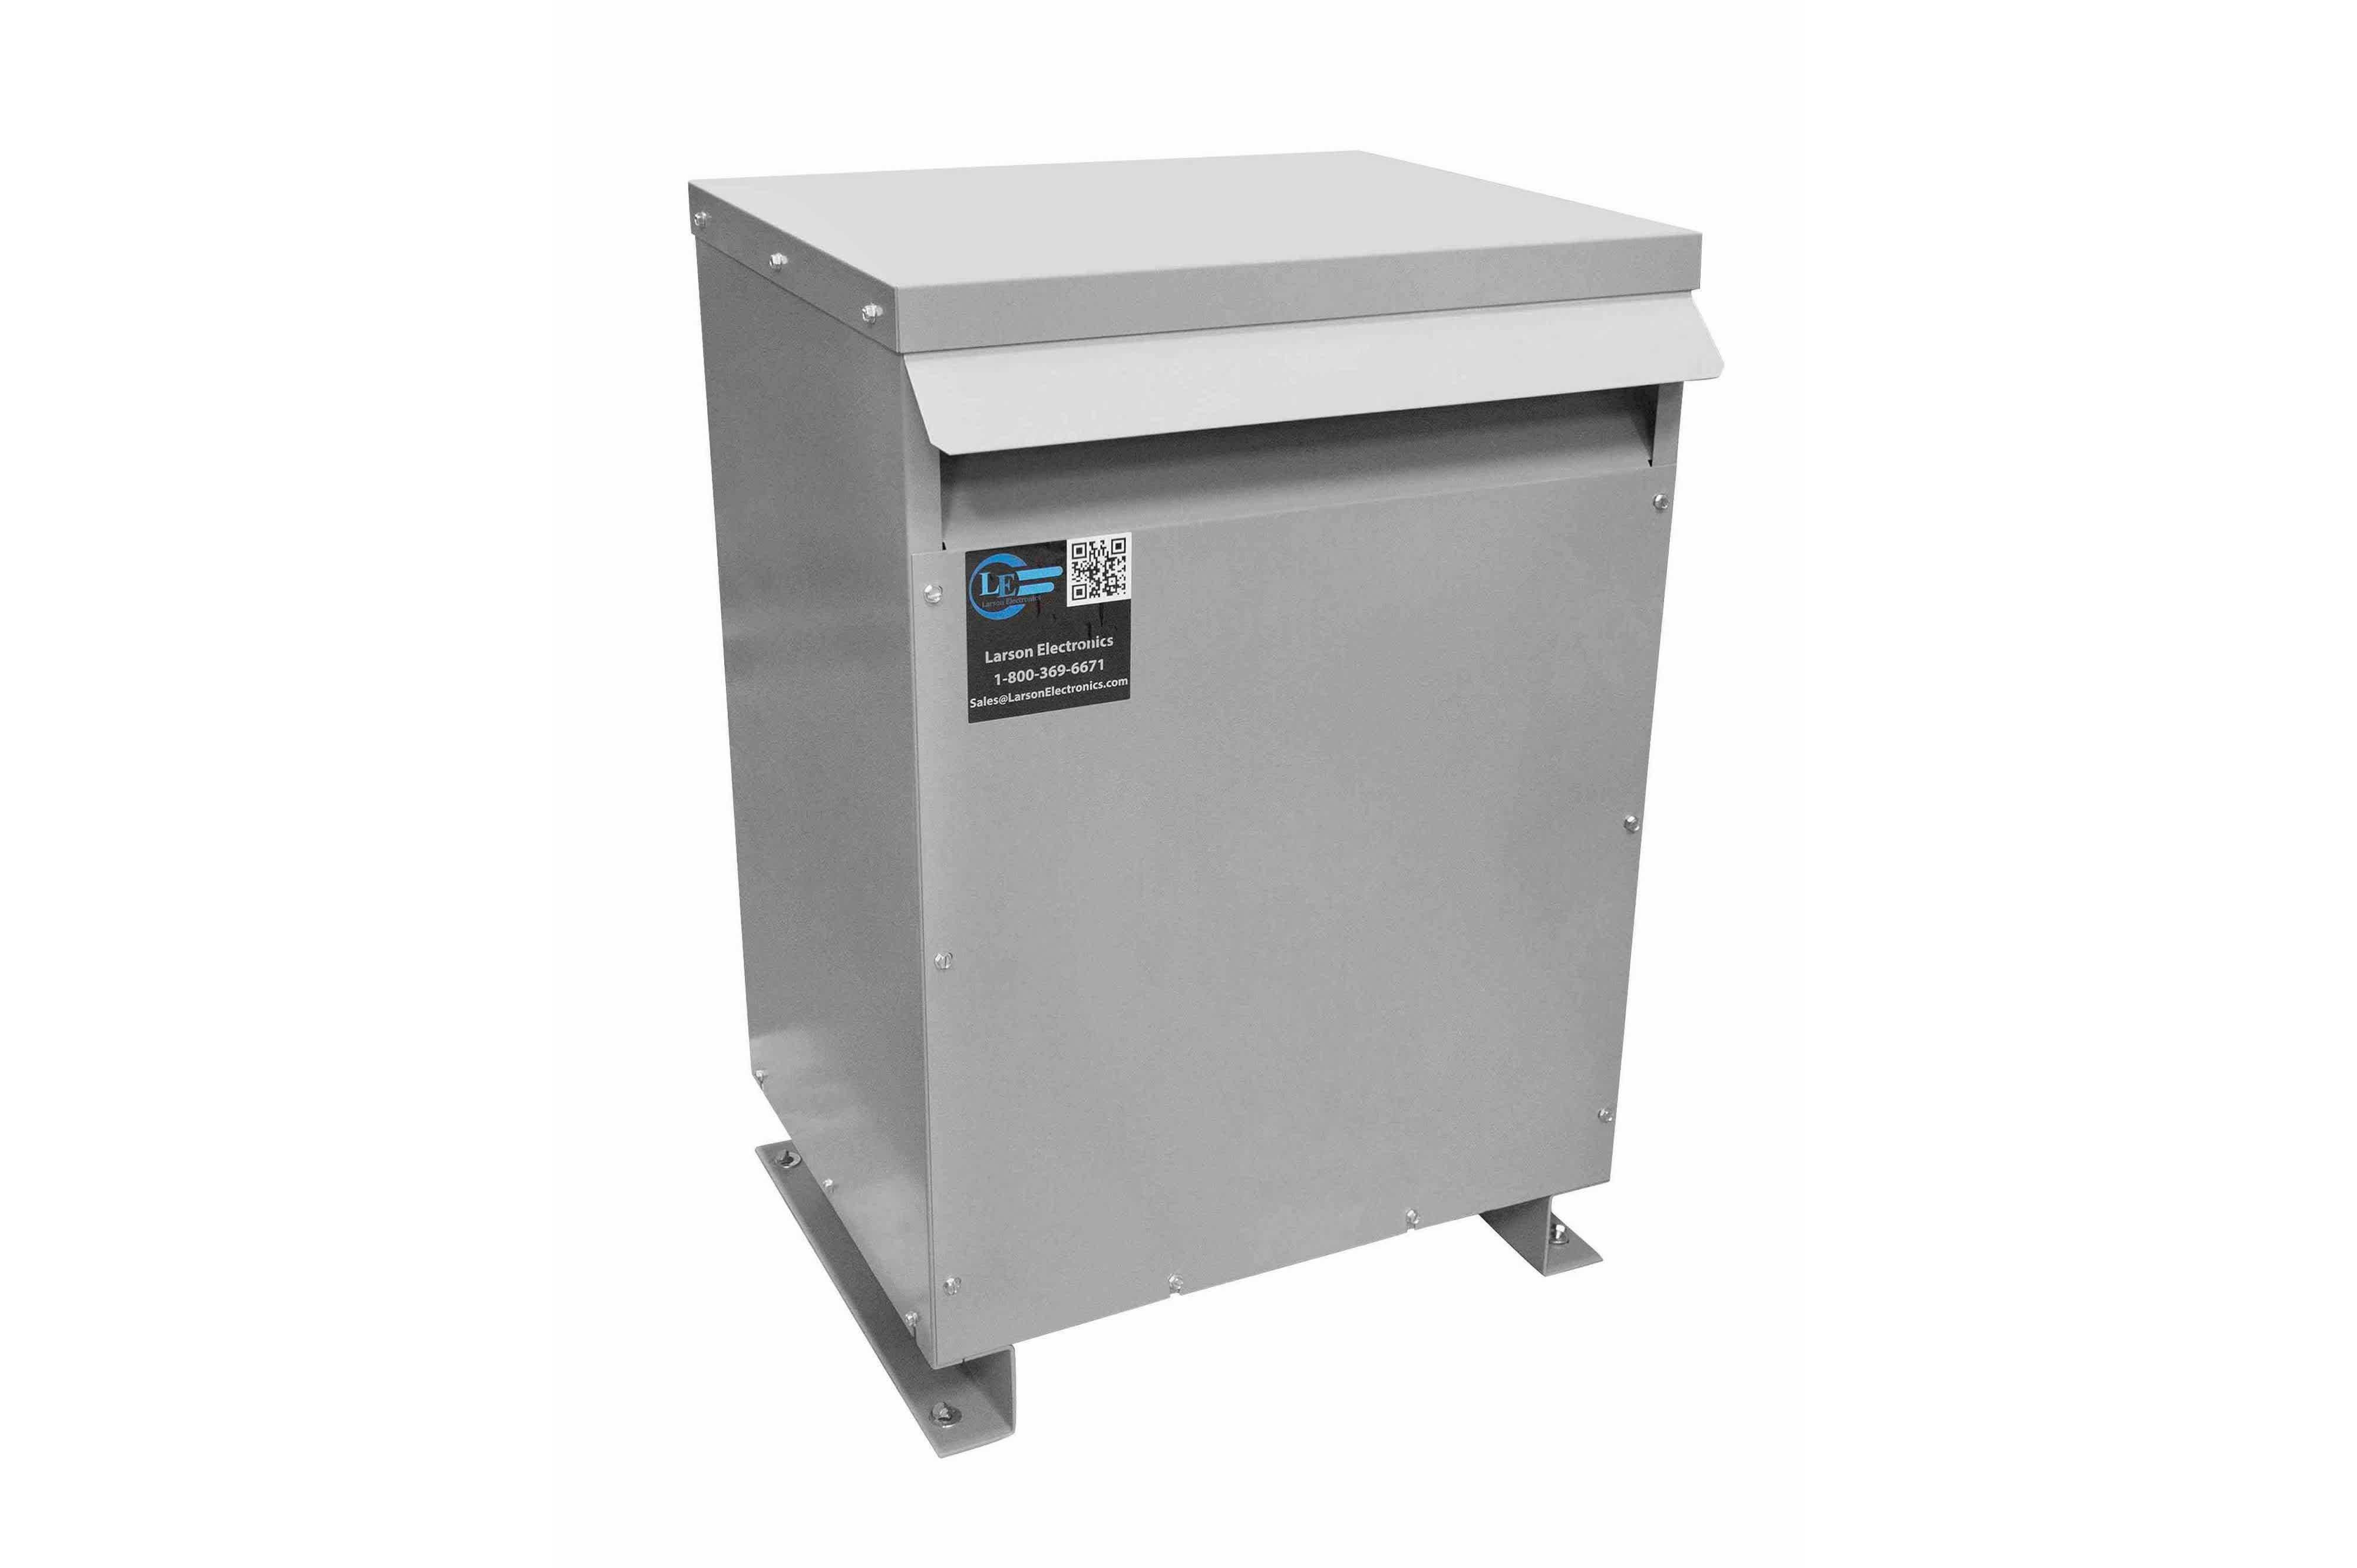 13 kVA 3PH Isolation Transformer, 480V Wye Primary, 415V Delta Secondary, N3R, Ventilated, 60 Hz